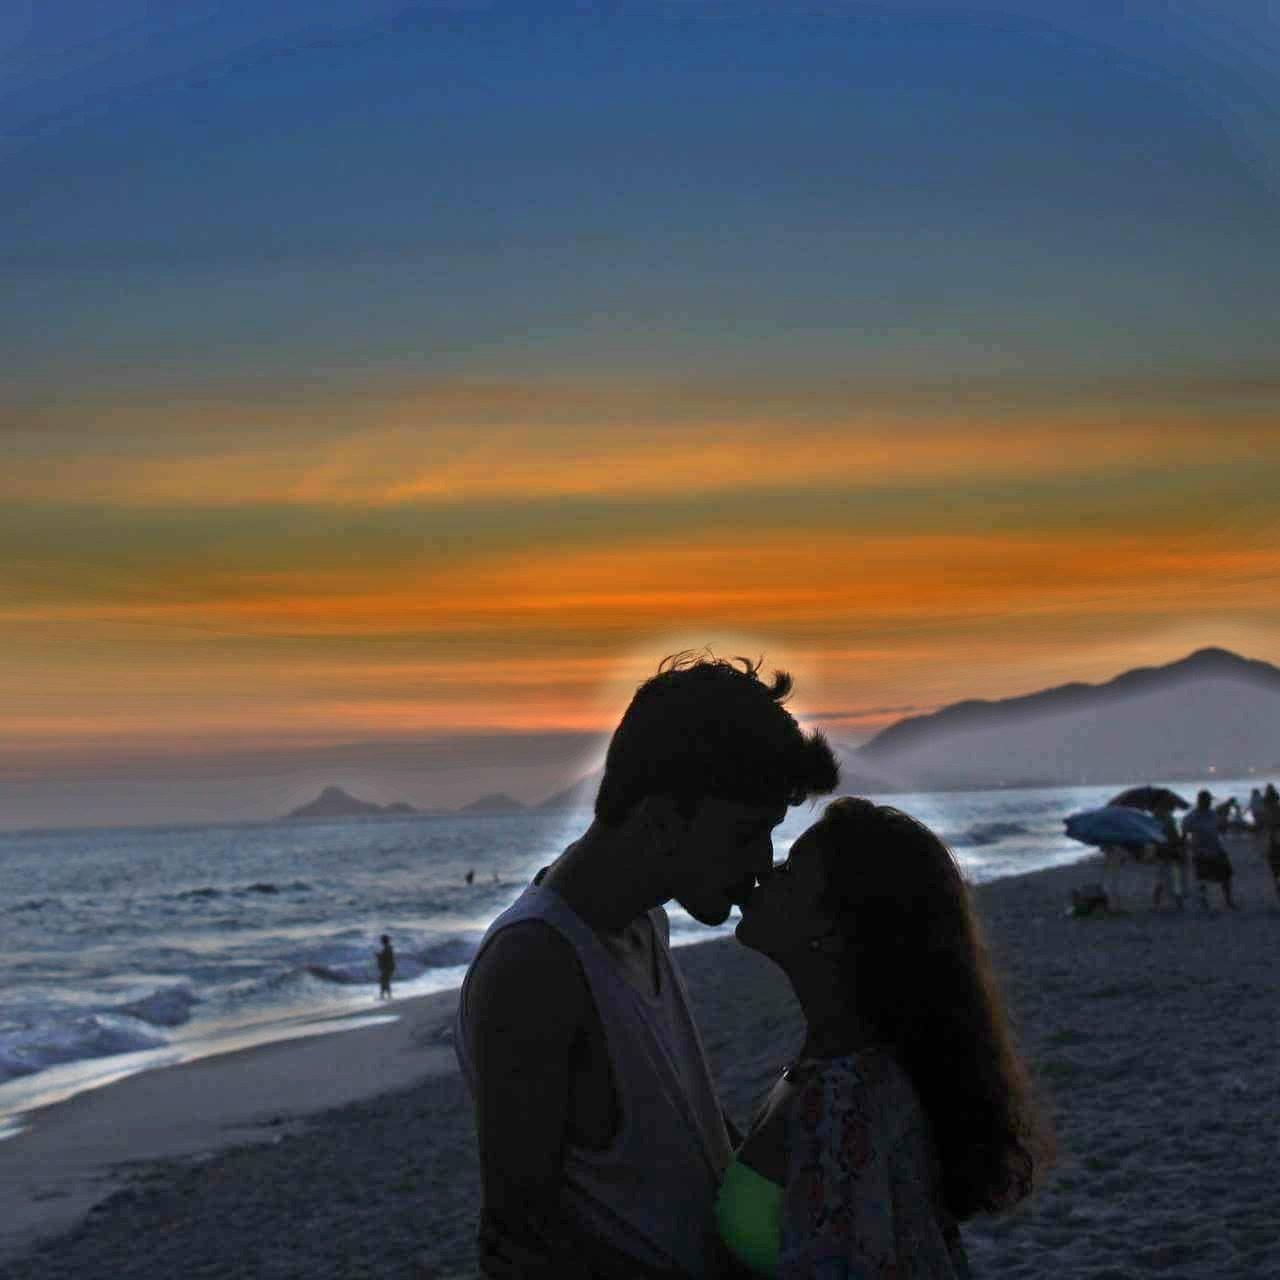 Fotos inspiradoras na praia, rio de janeiro, fotos na praia, kimono, fotos com namorado na praia, pôr do sol